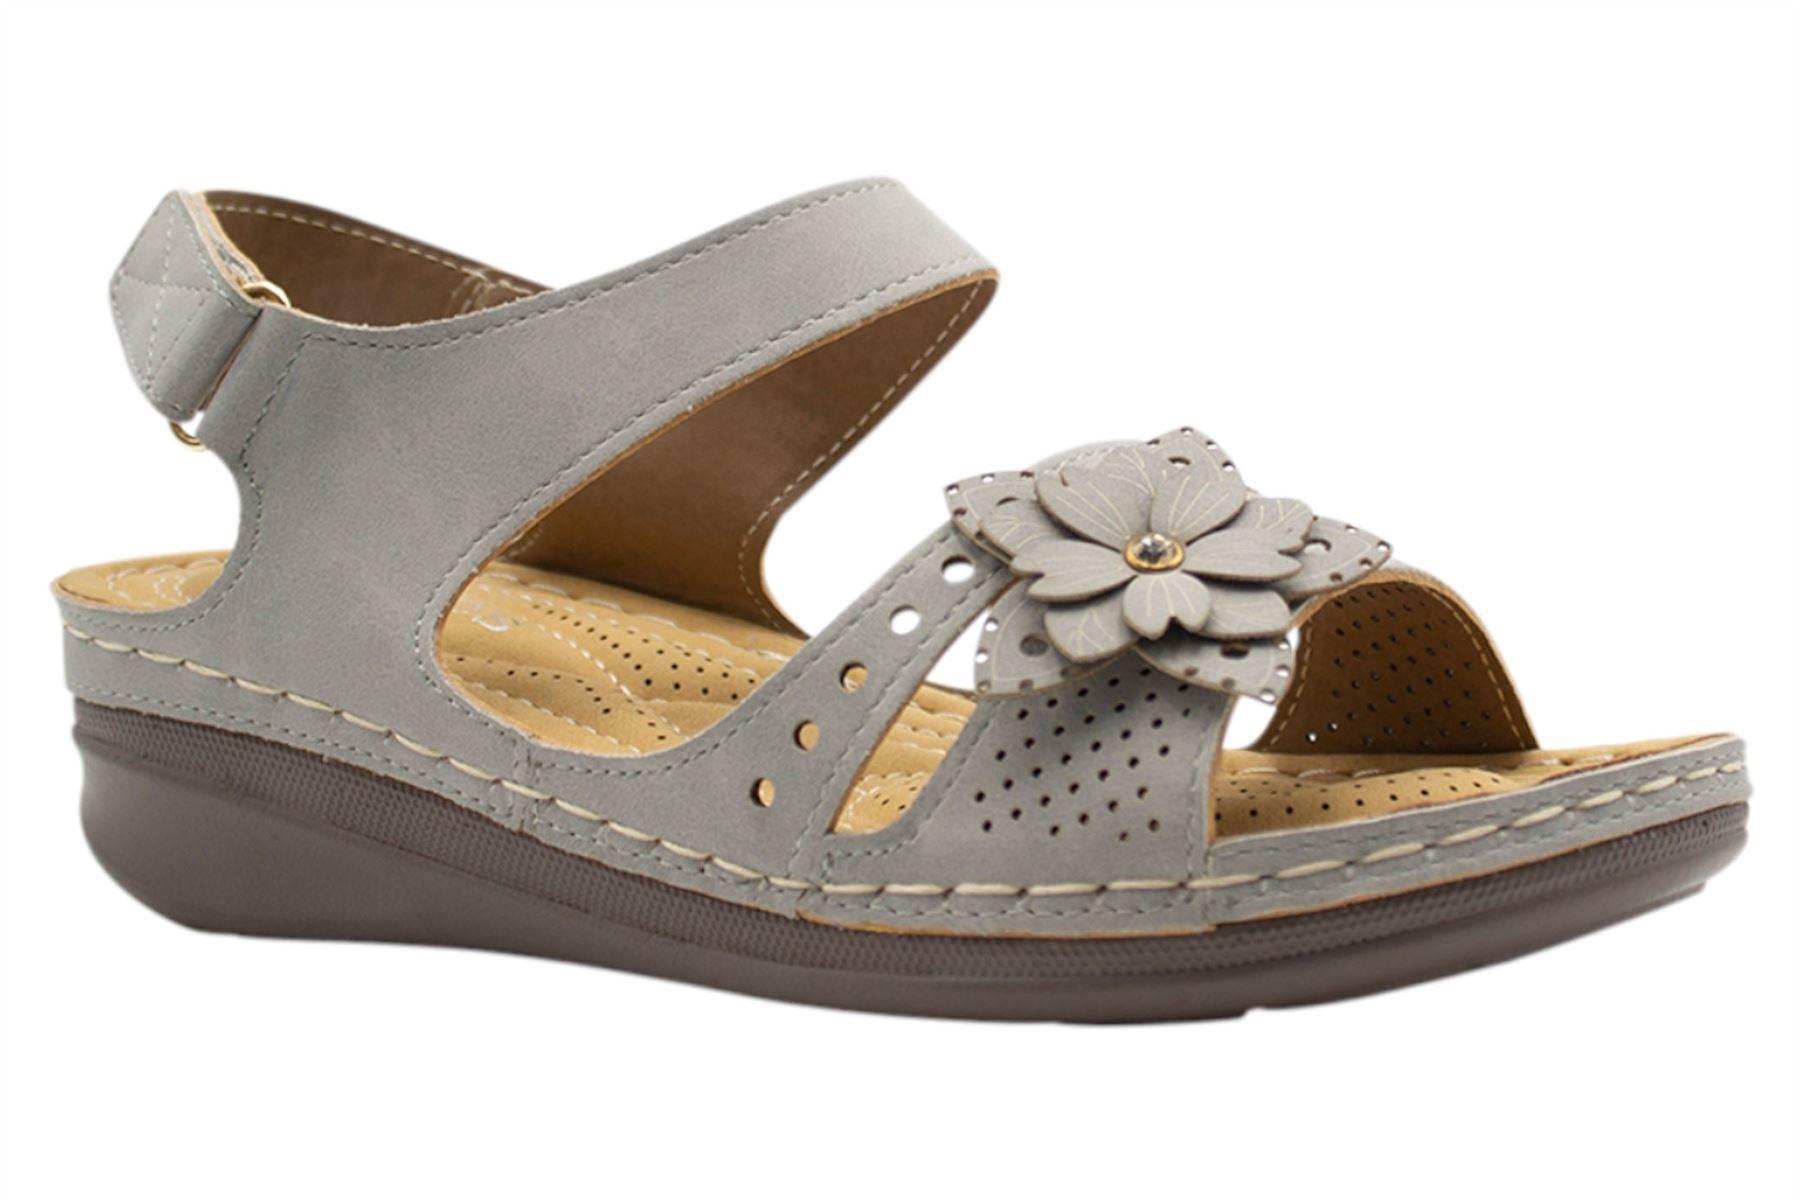 Ladies-Wedge-Heel-Sandal-Womens-Comfort-Cushion-Strapy-Summer-Shoes miniatura 29